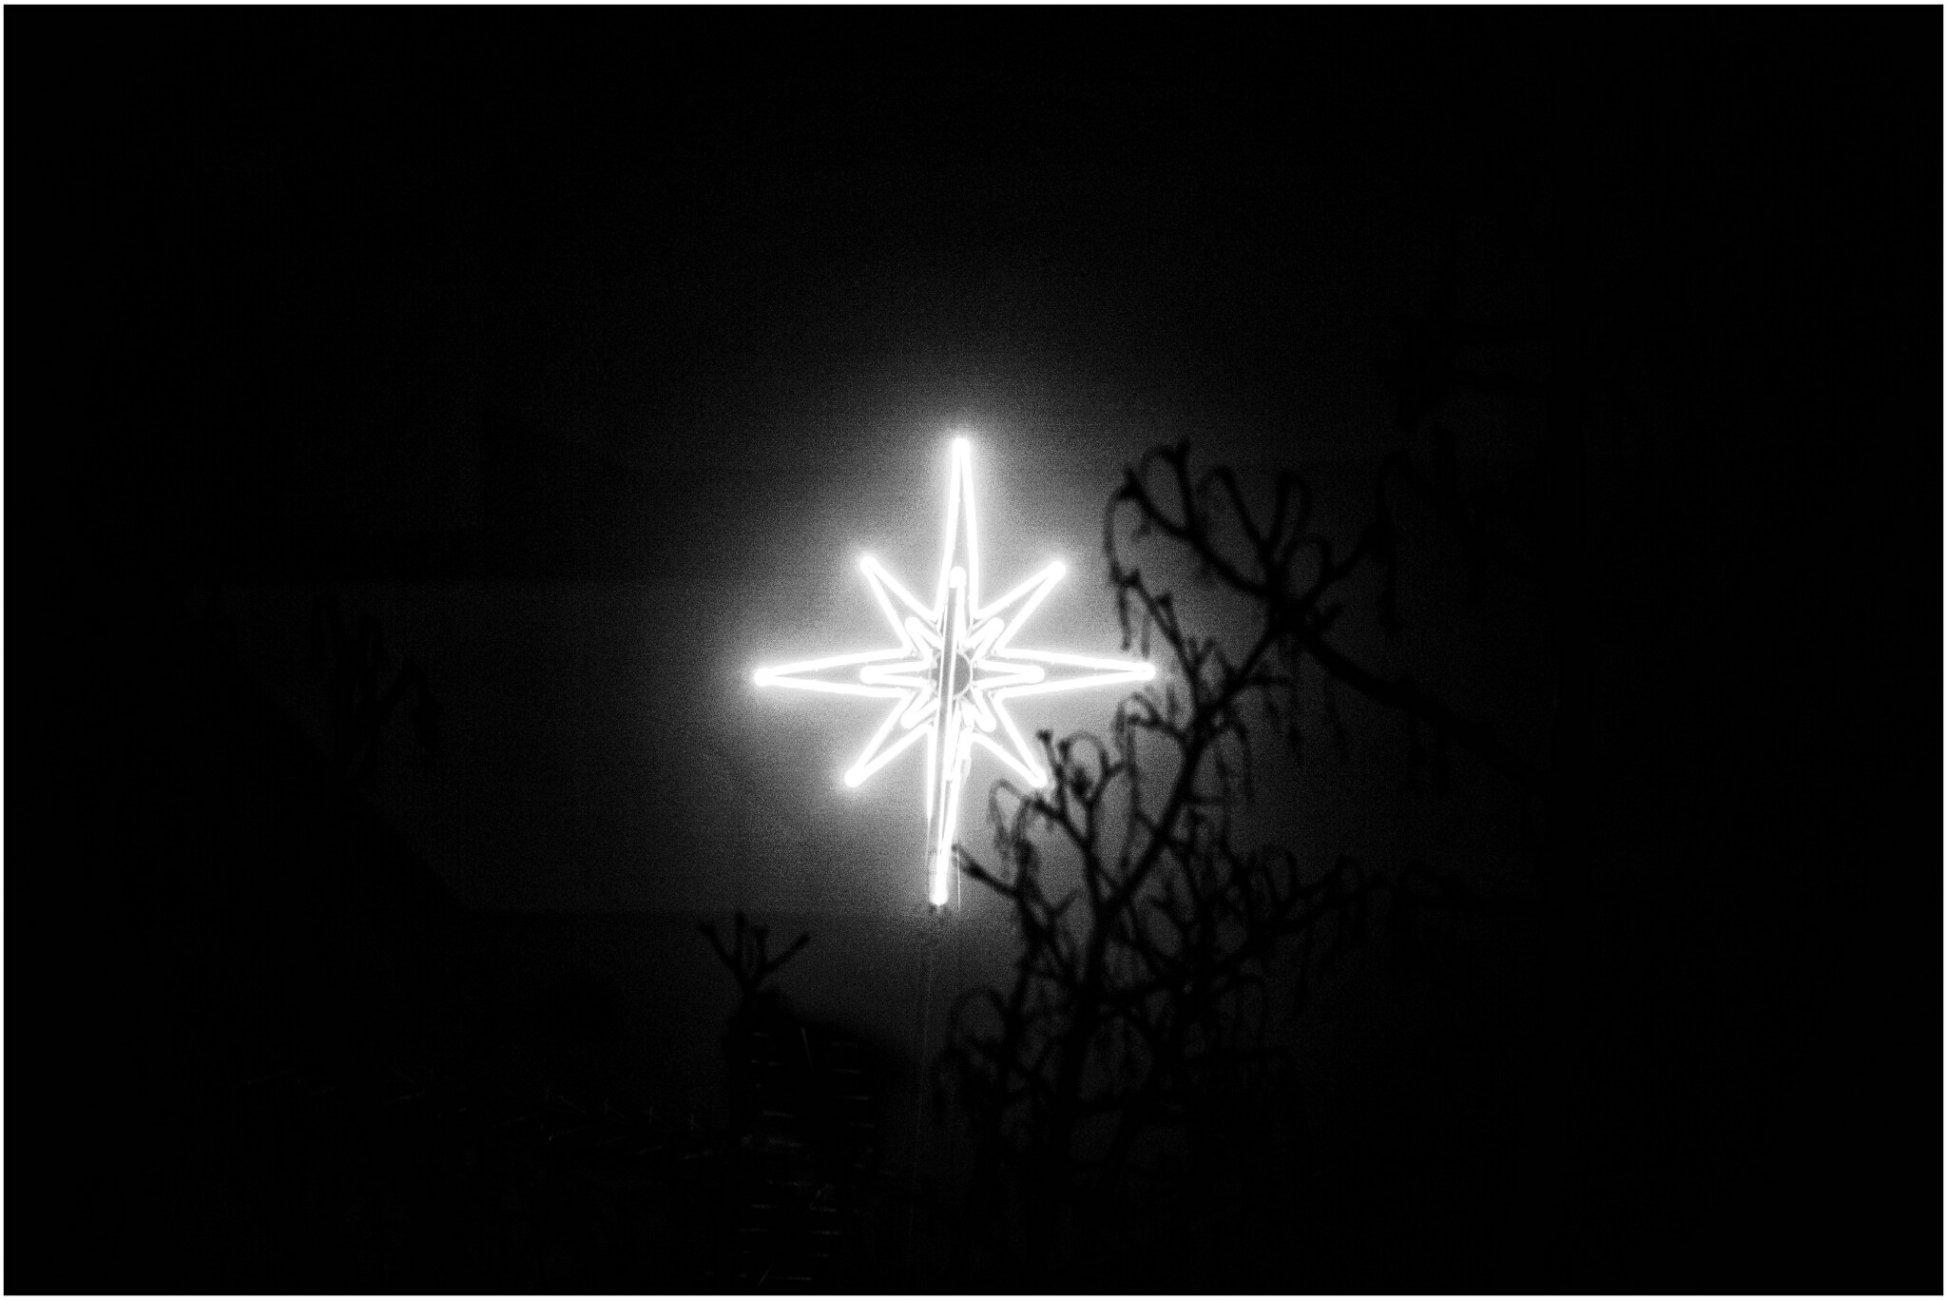 ~ Star Of Wonder ~